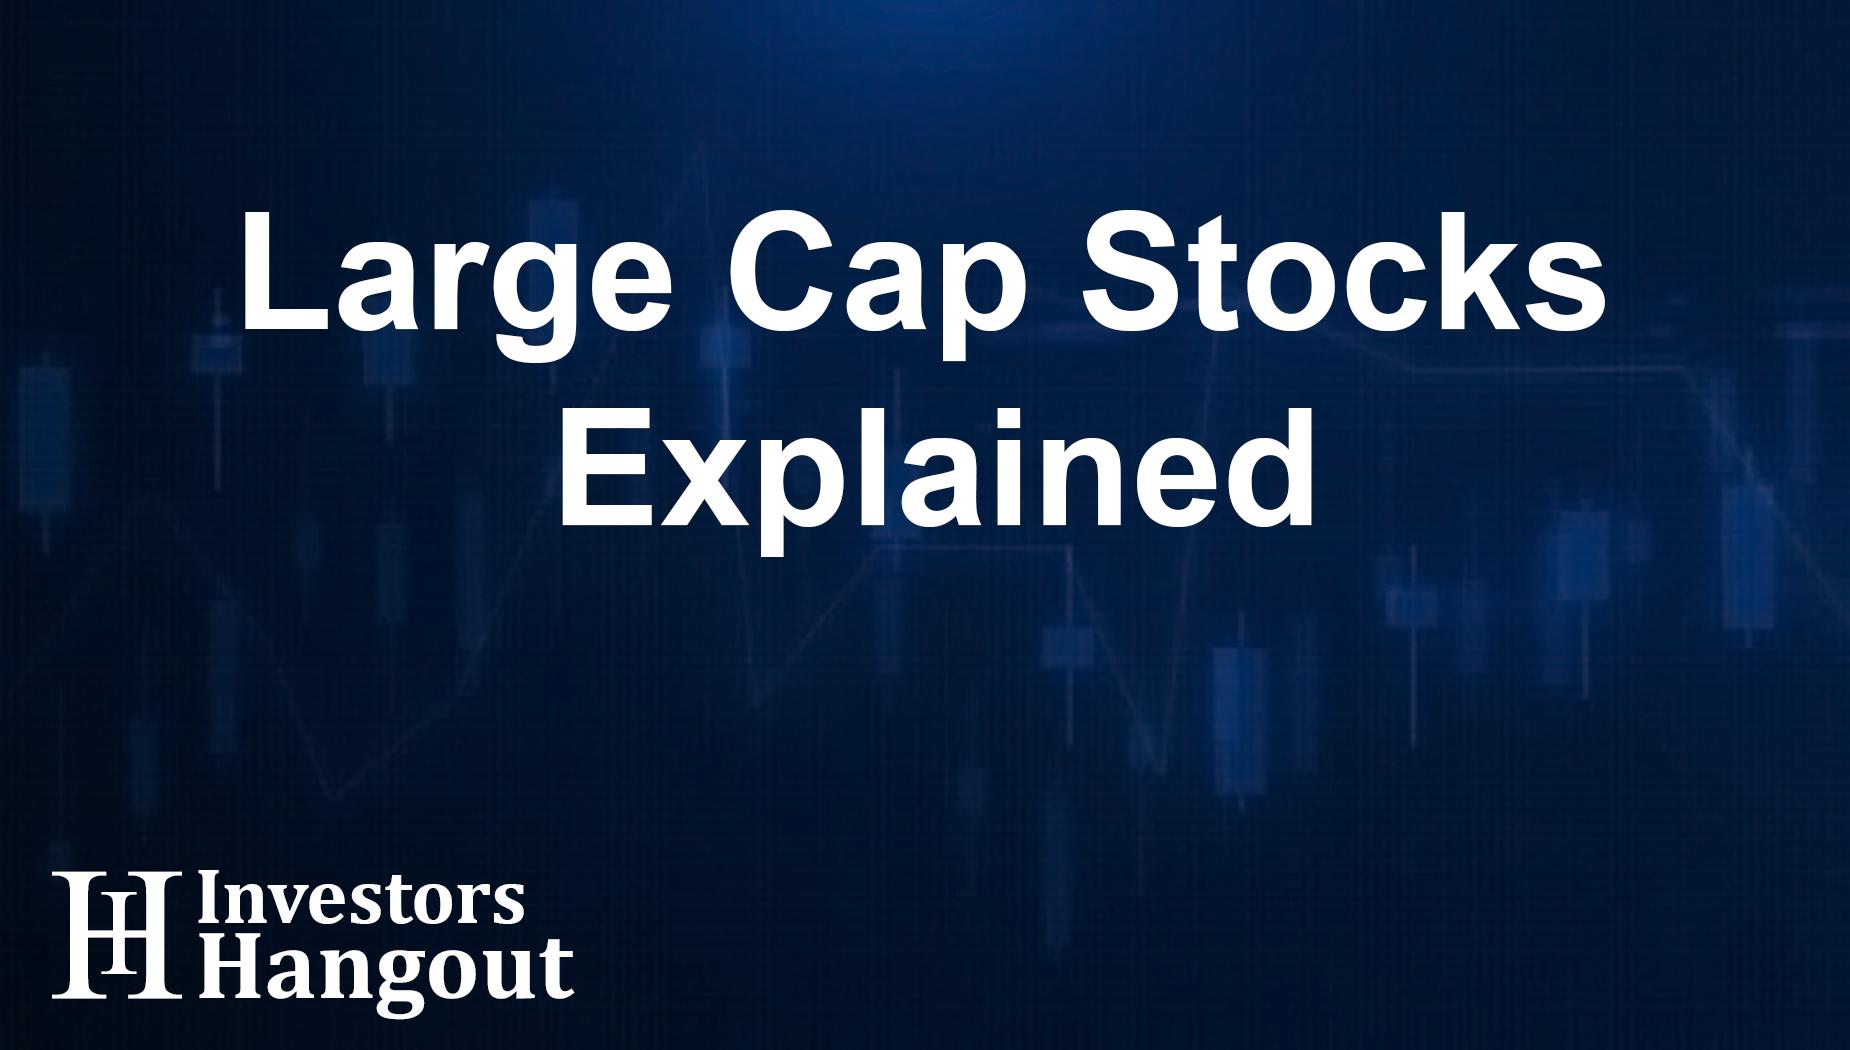 Large Cap Stocks Explained